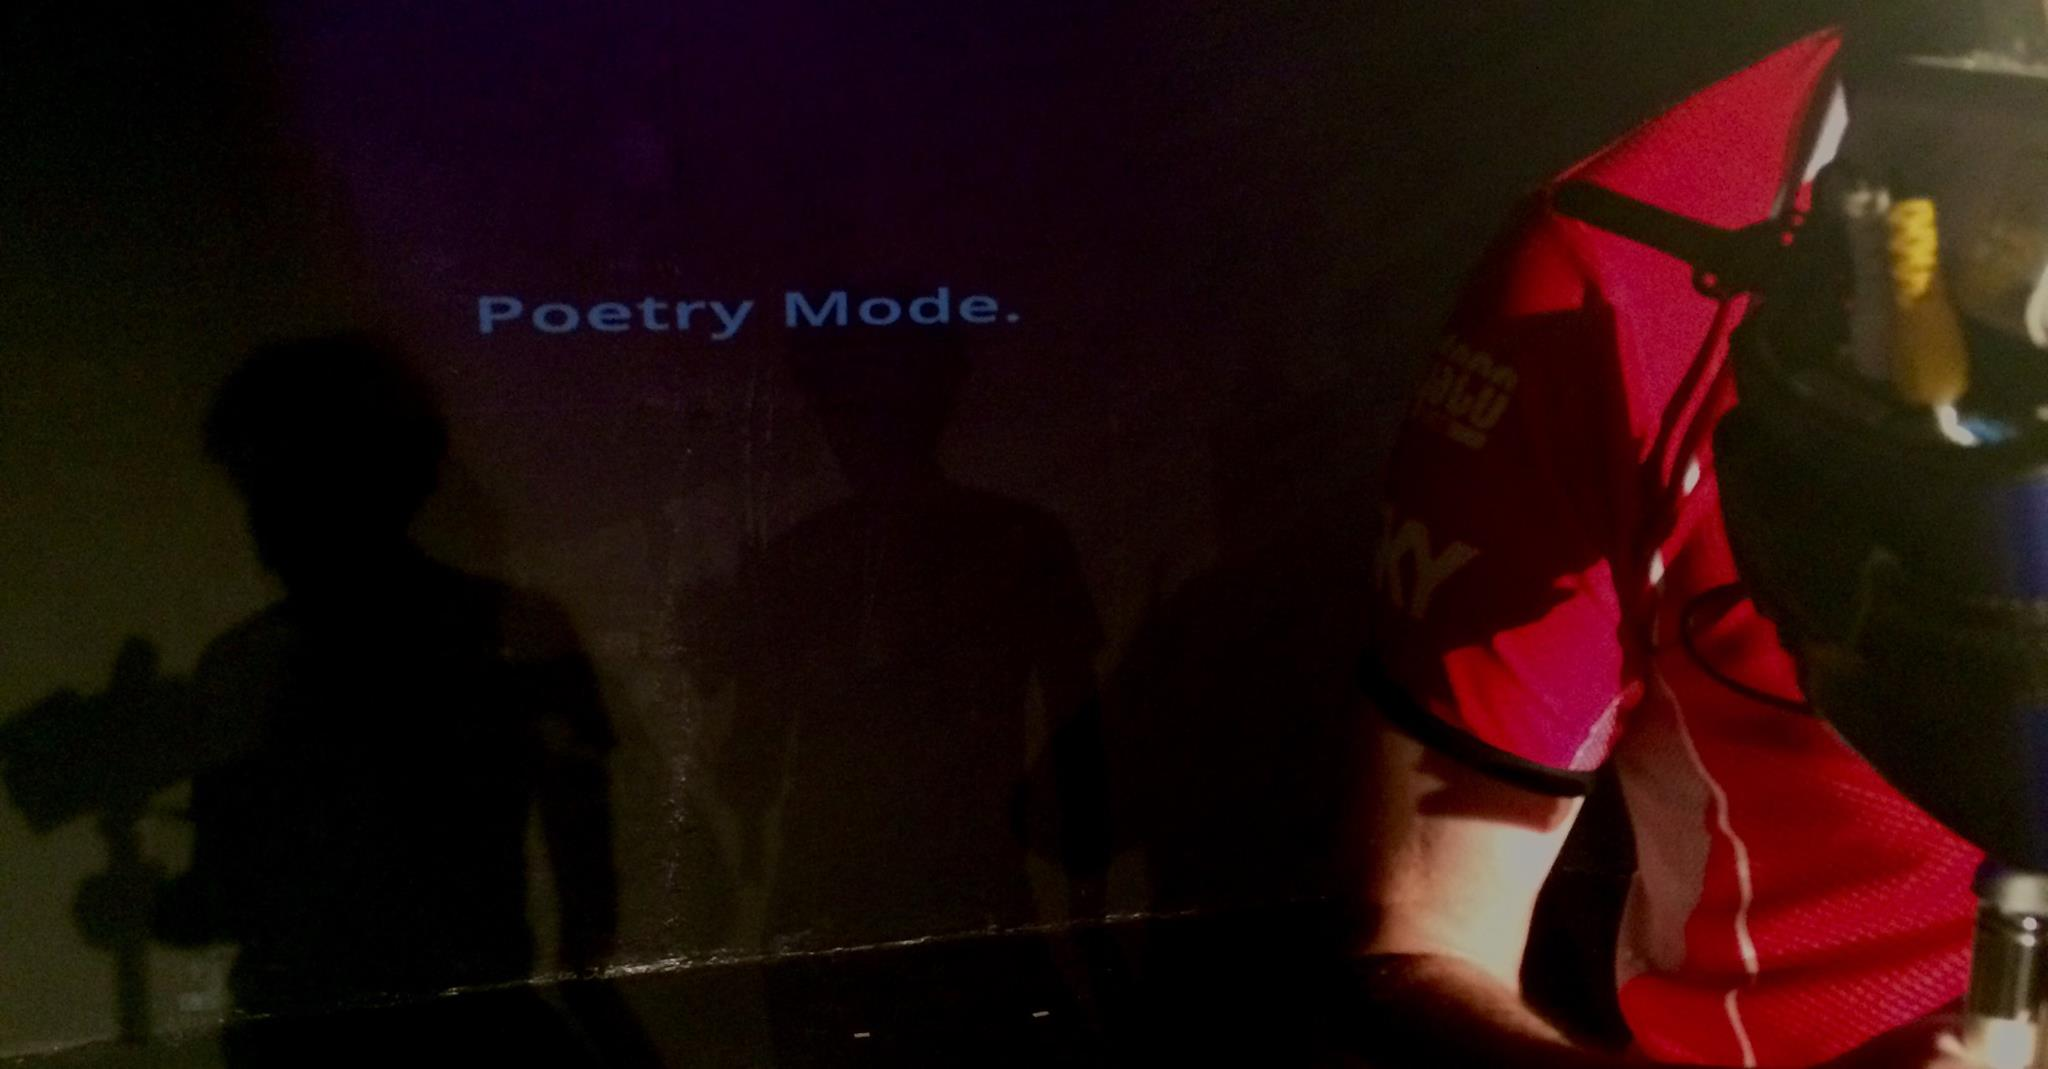 poetry mode.jpg